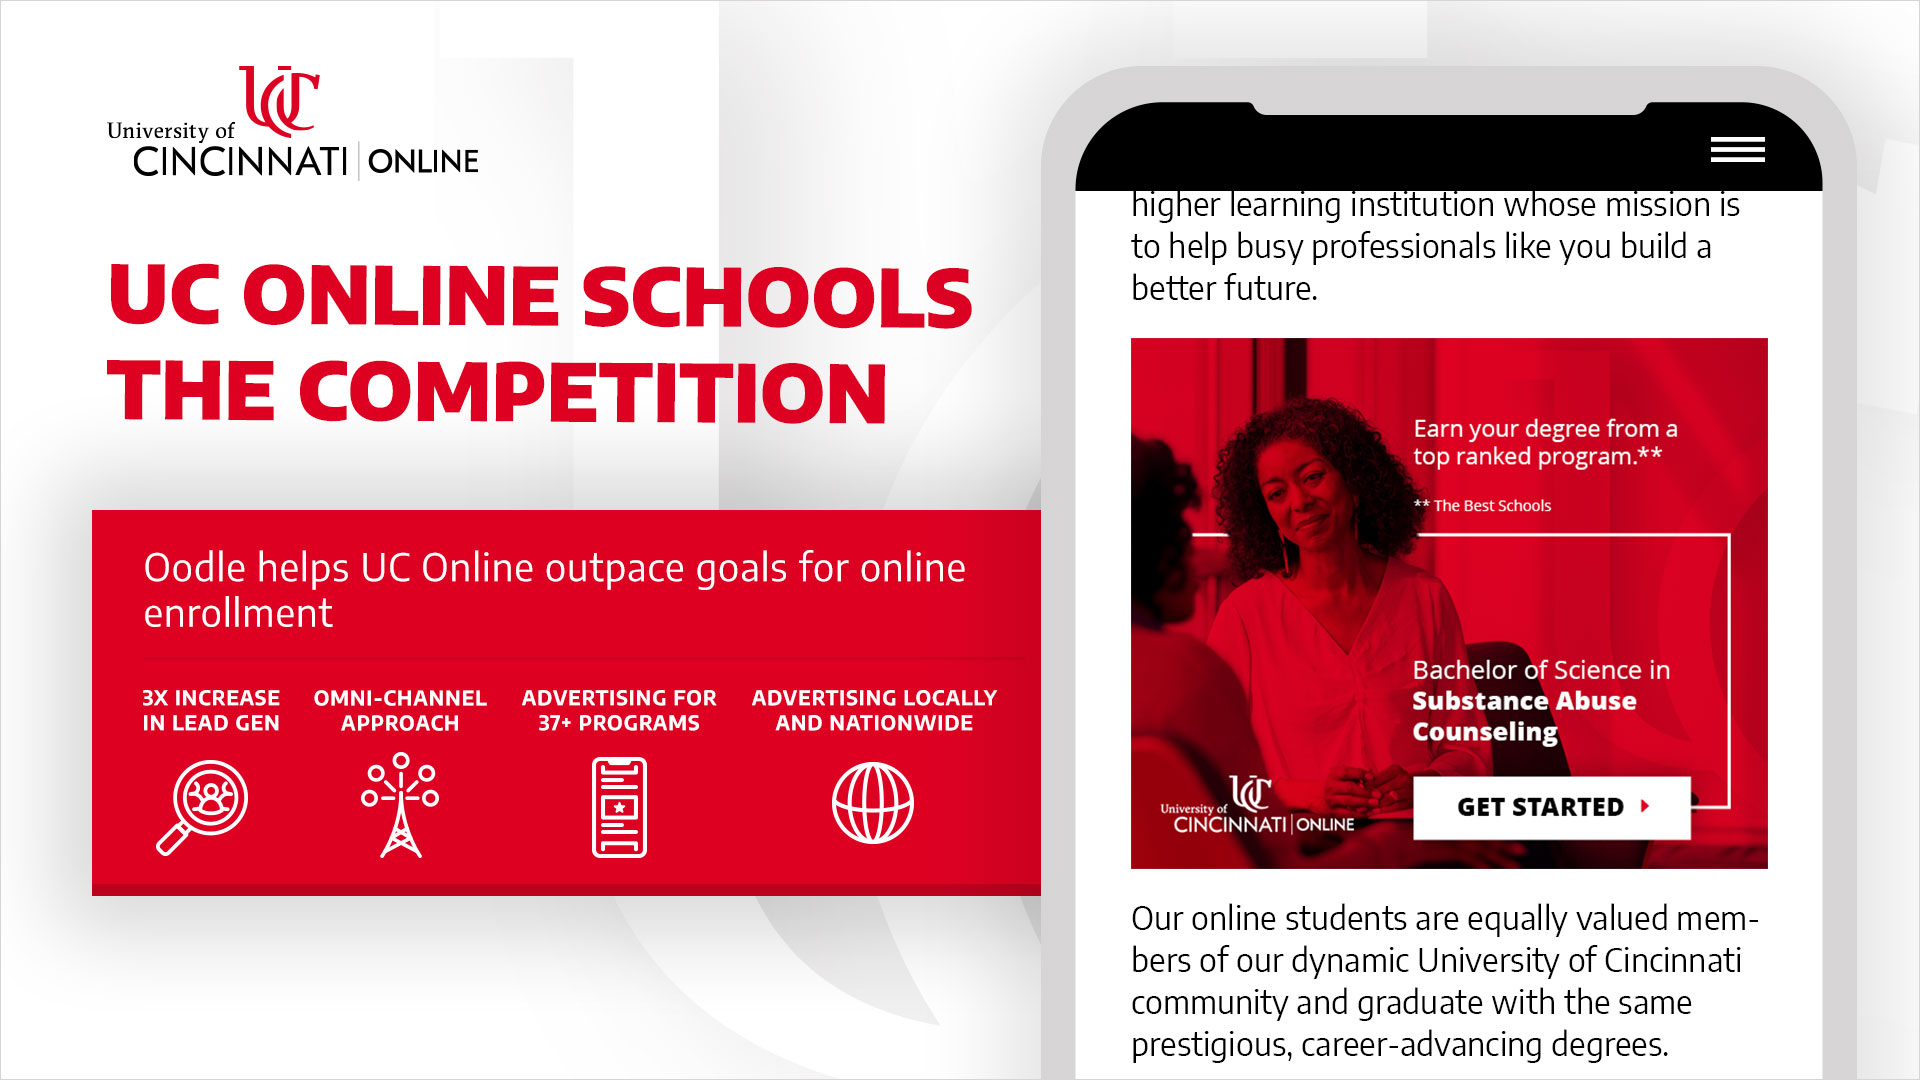 University of Cincinnati Online schools the competition